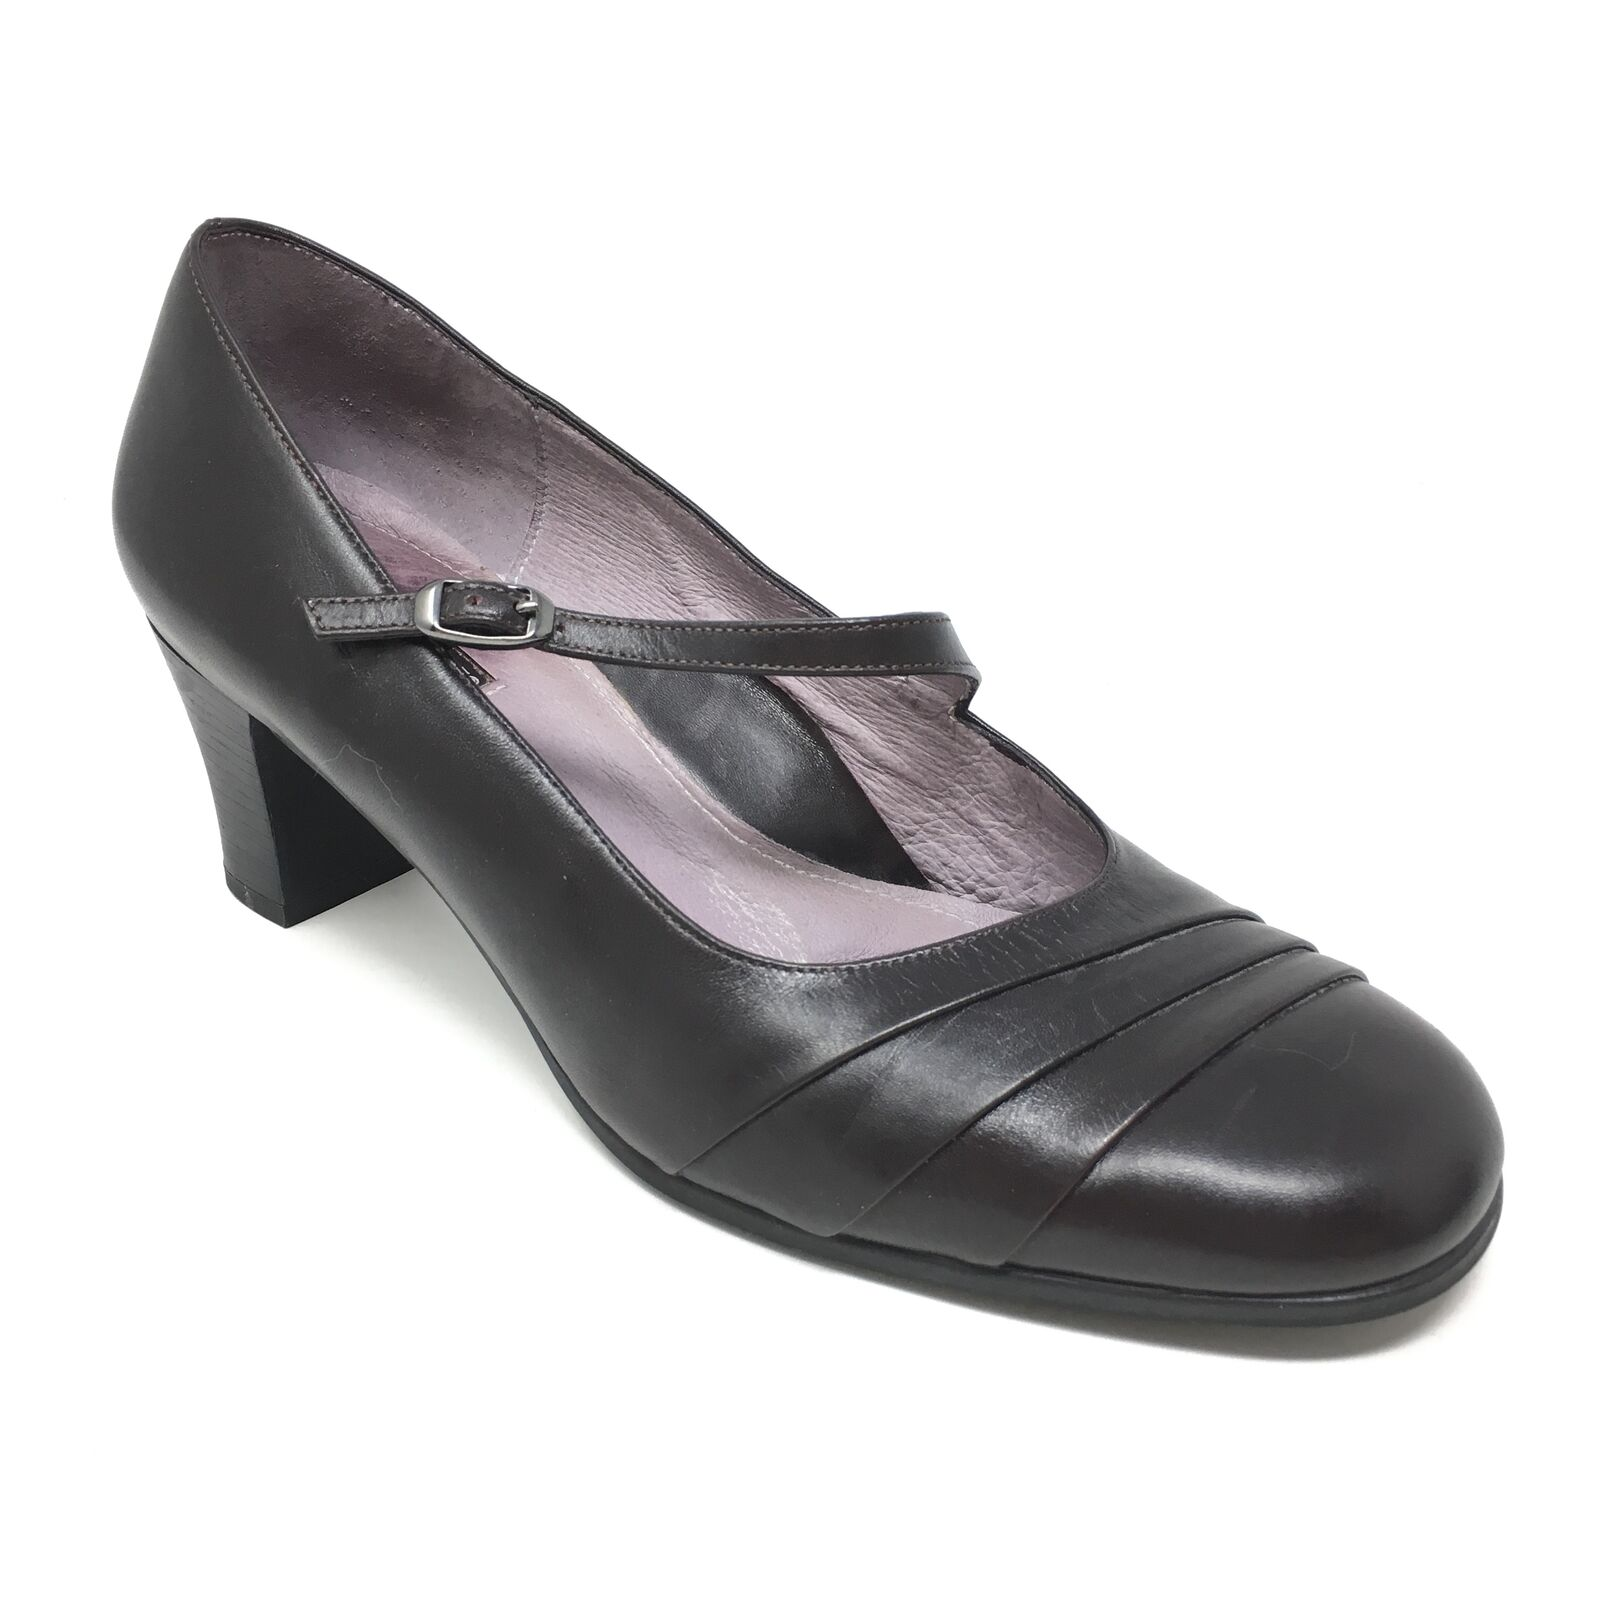 Women's Beautifeel Pump Heels shoes Sz 39 EU 8-8.5 US Mary Jane Brown Leather C13